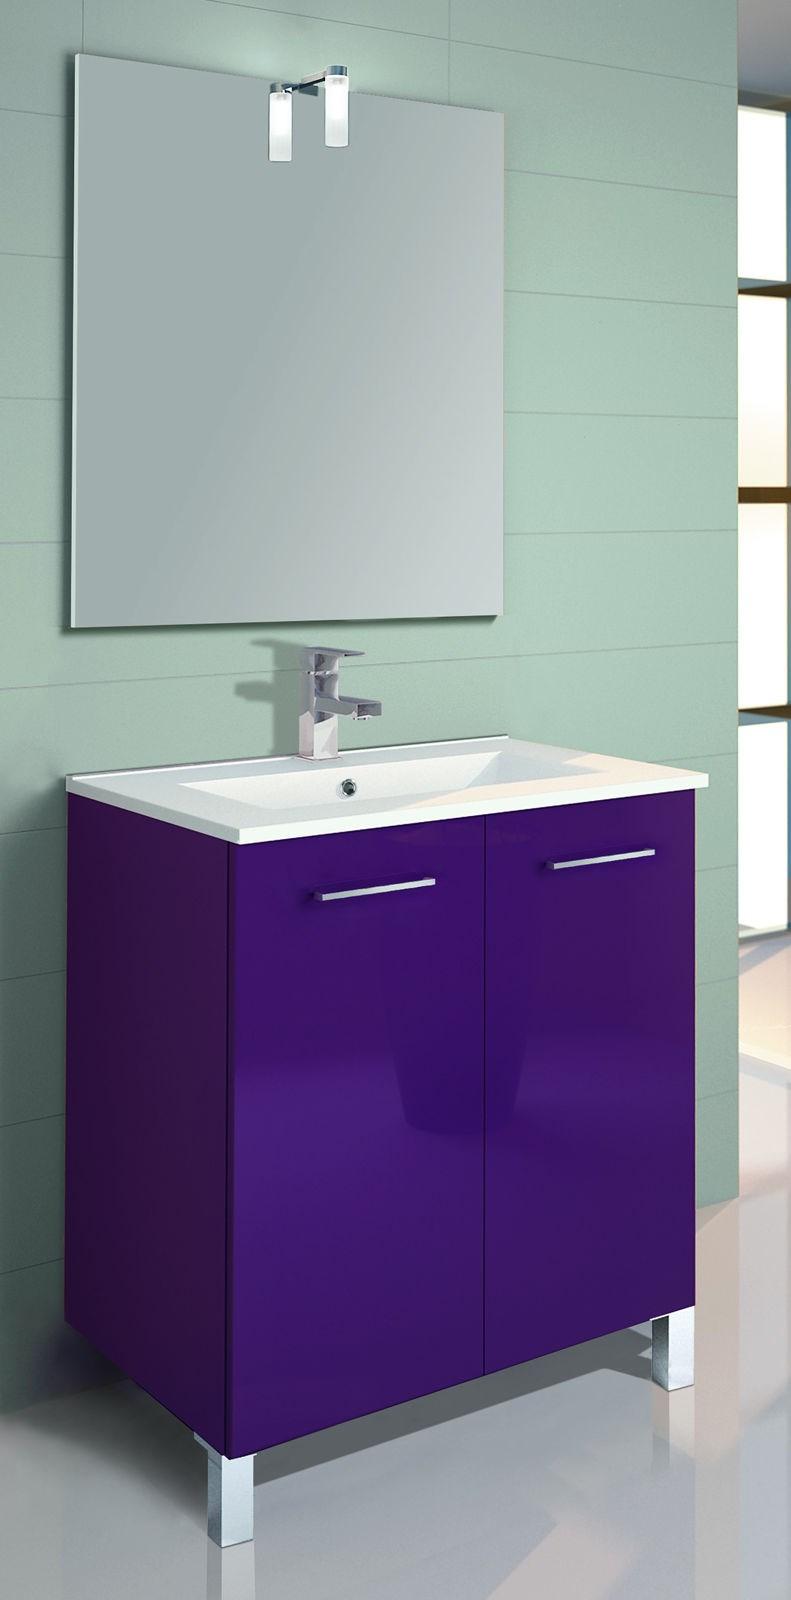 hauteur vasque salle de bain. Black Bedroom Furniture Sets. Home Design Ideas